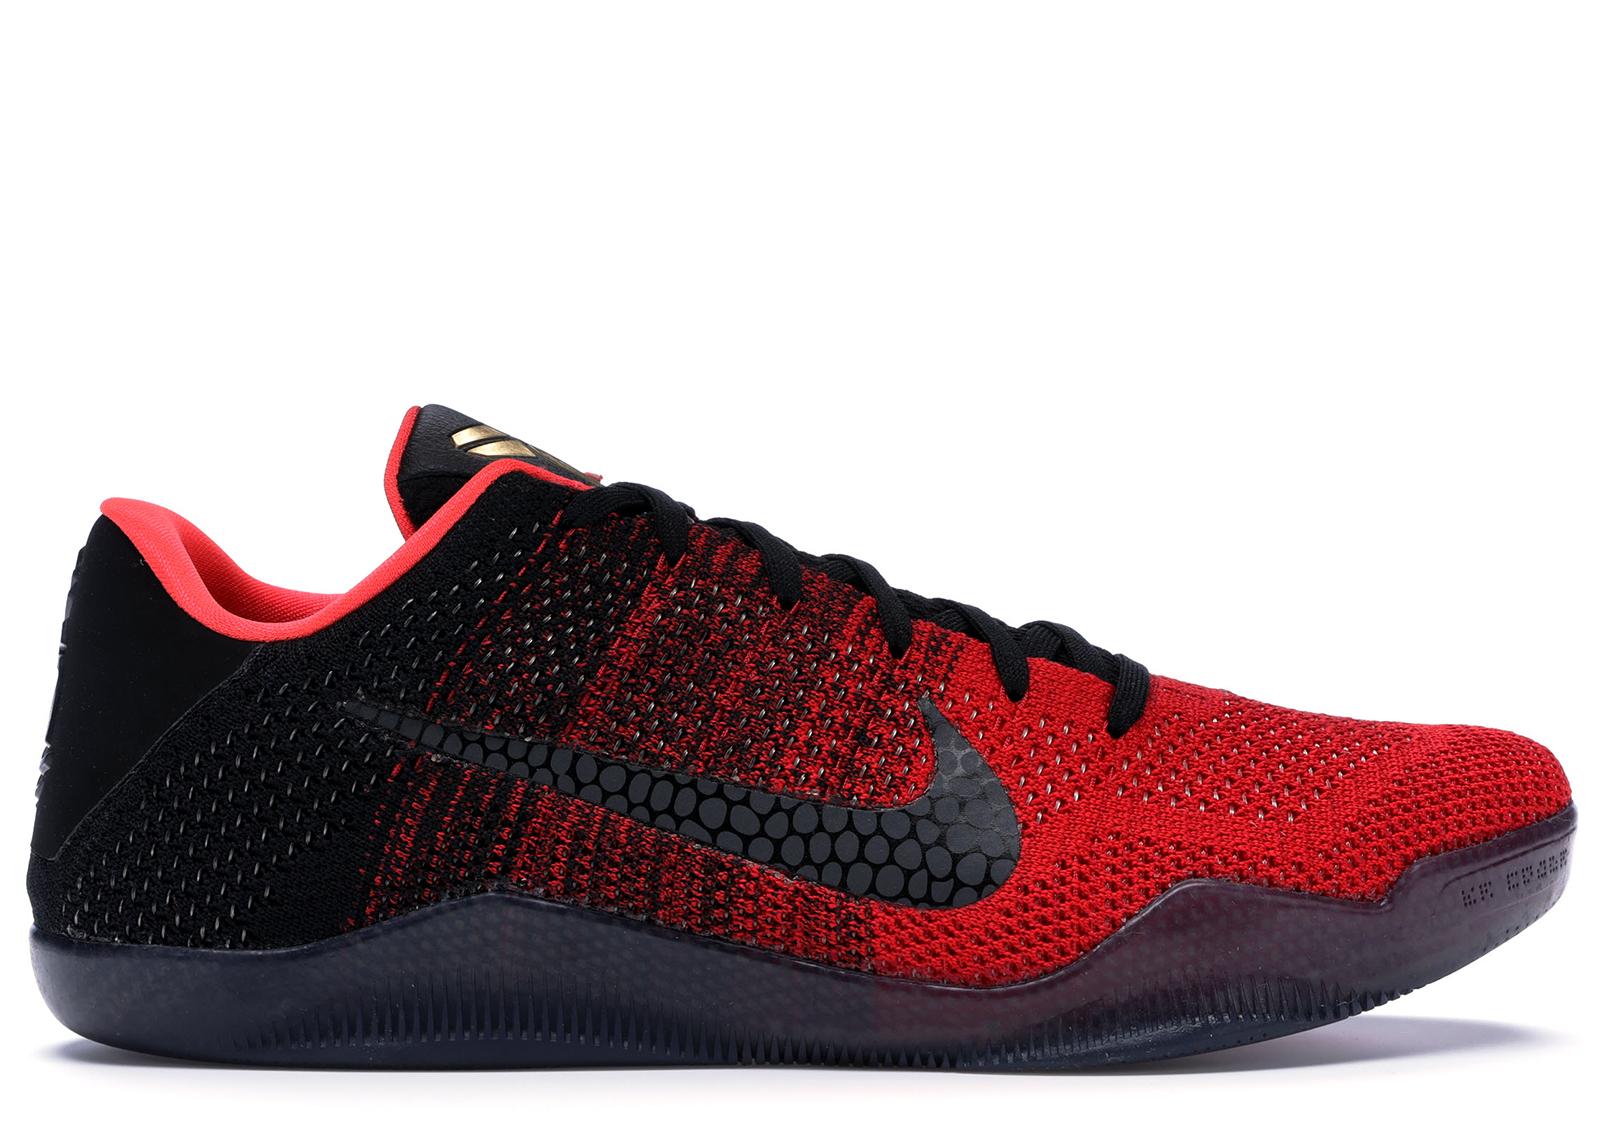 Nike Kobe 11 Elite Low Achilles Heel - 822675-670